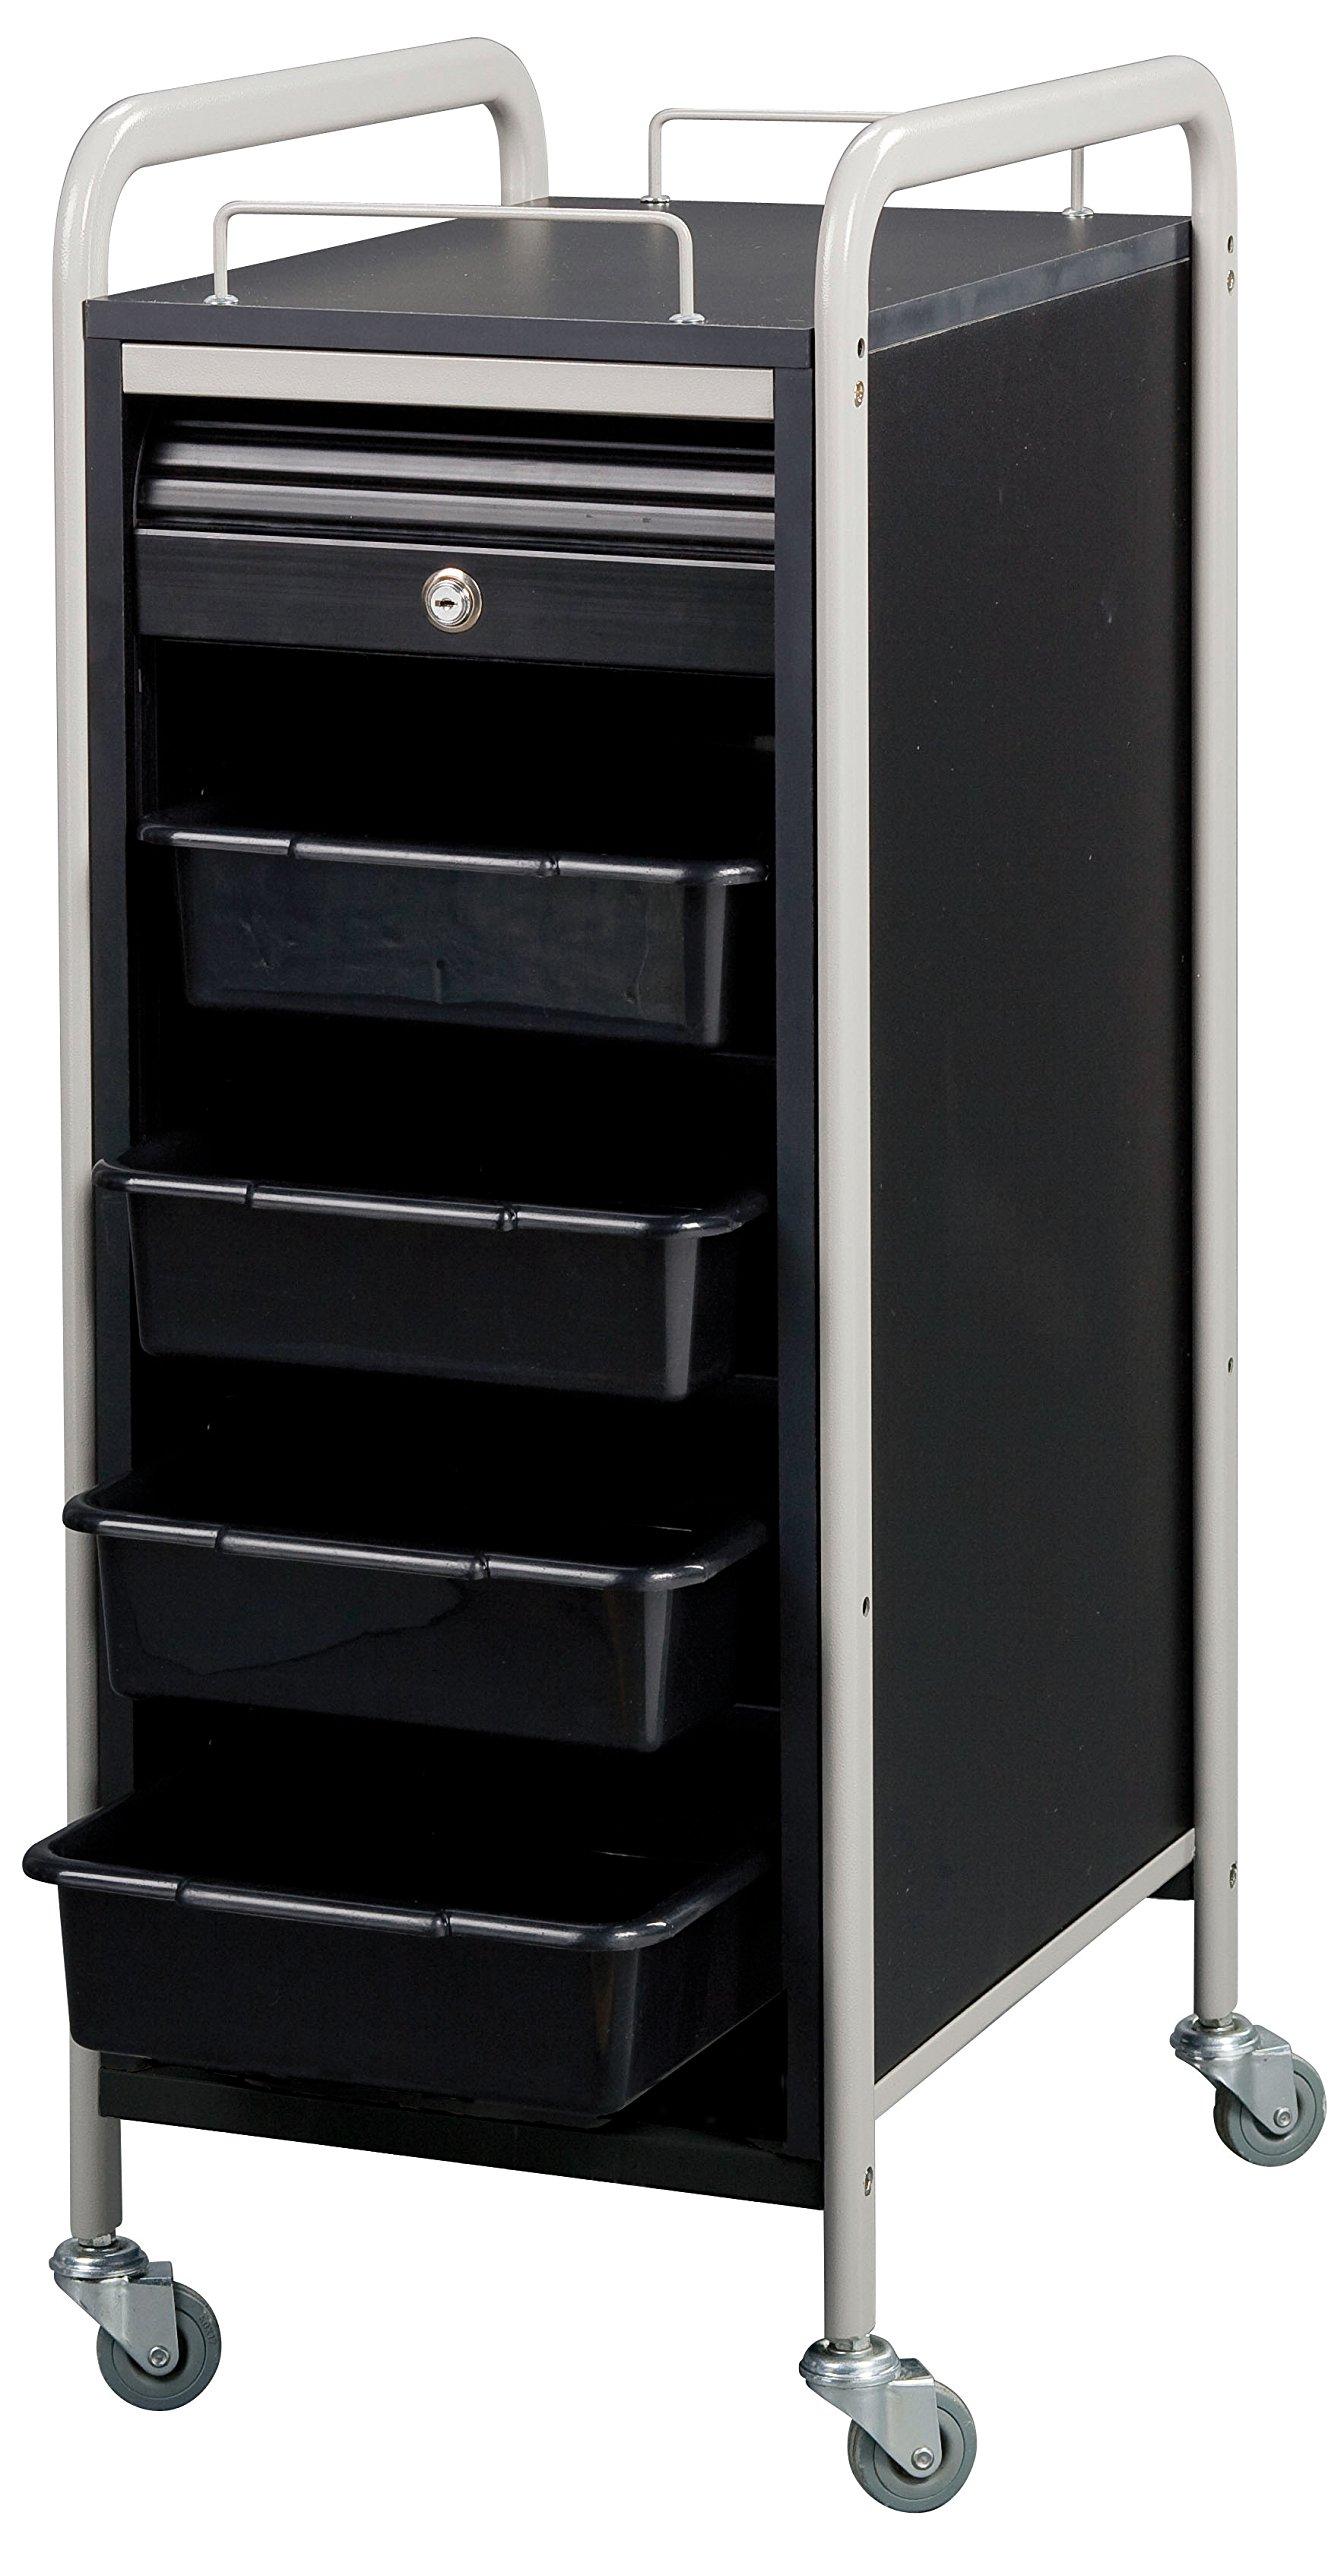 Savvy SAV-505-BB Salon Lockable Roller Cart Trolley in (BLACK / GRAY) + Free YS Park L-Clips ($15 value)